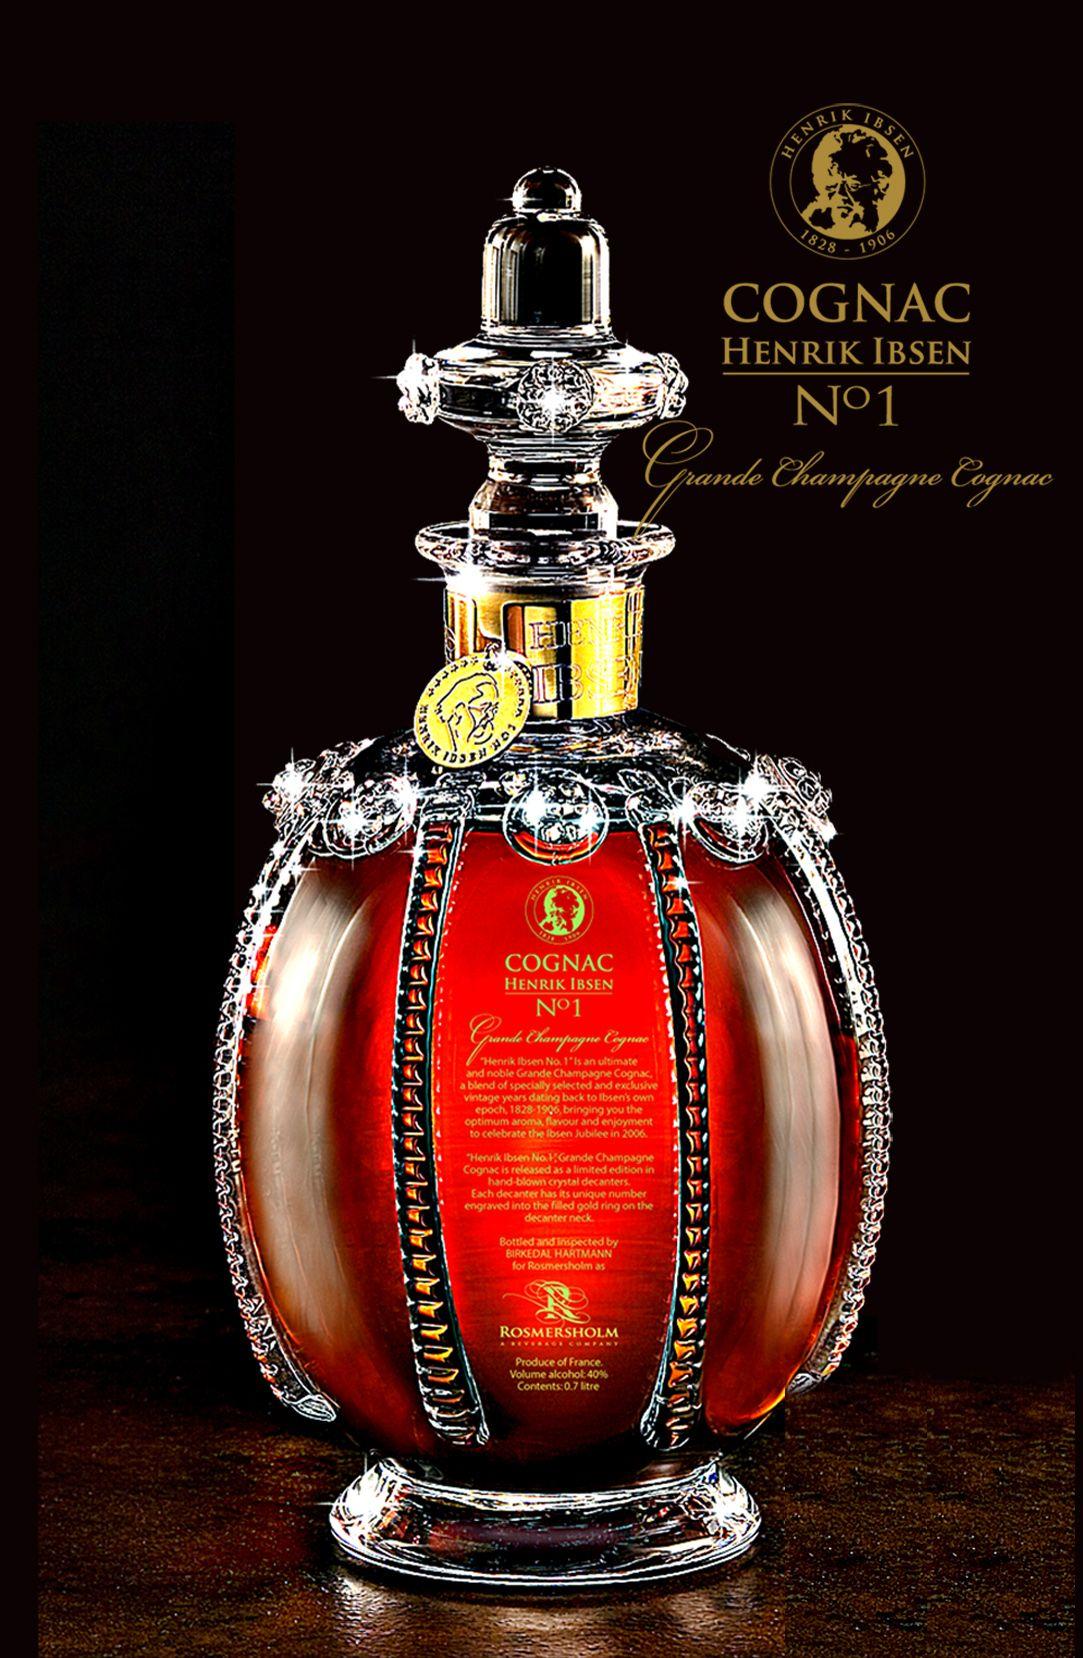 Cognac Alexander Valentino Via Leslie Sturdevant Onto Cognac Red Wine Champagne Cigars Liquor Bottles Alcohol Bottles Wine And Liquor